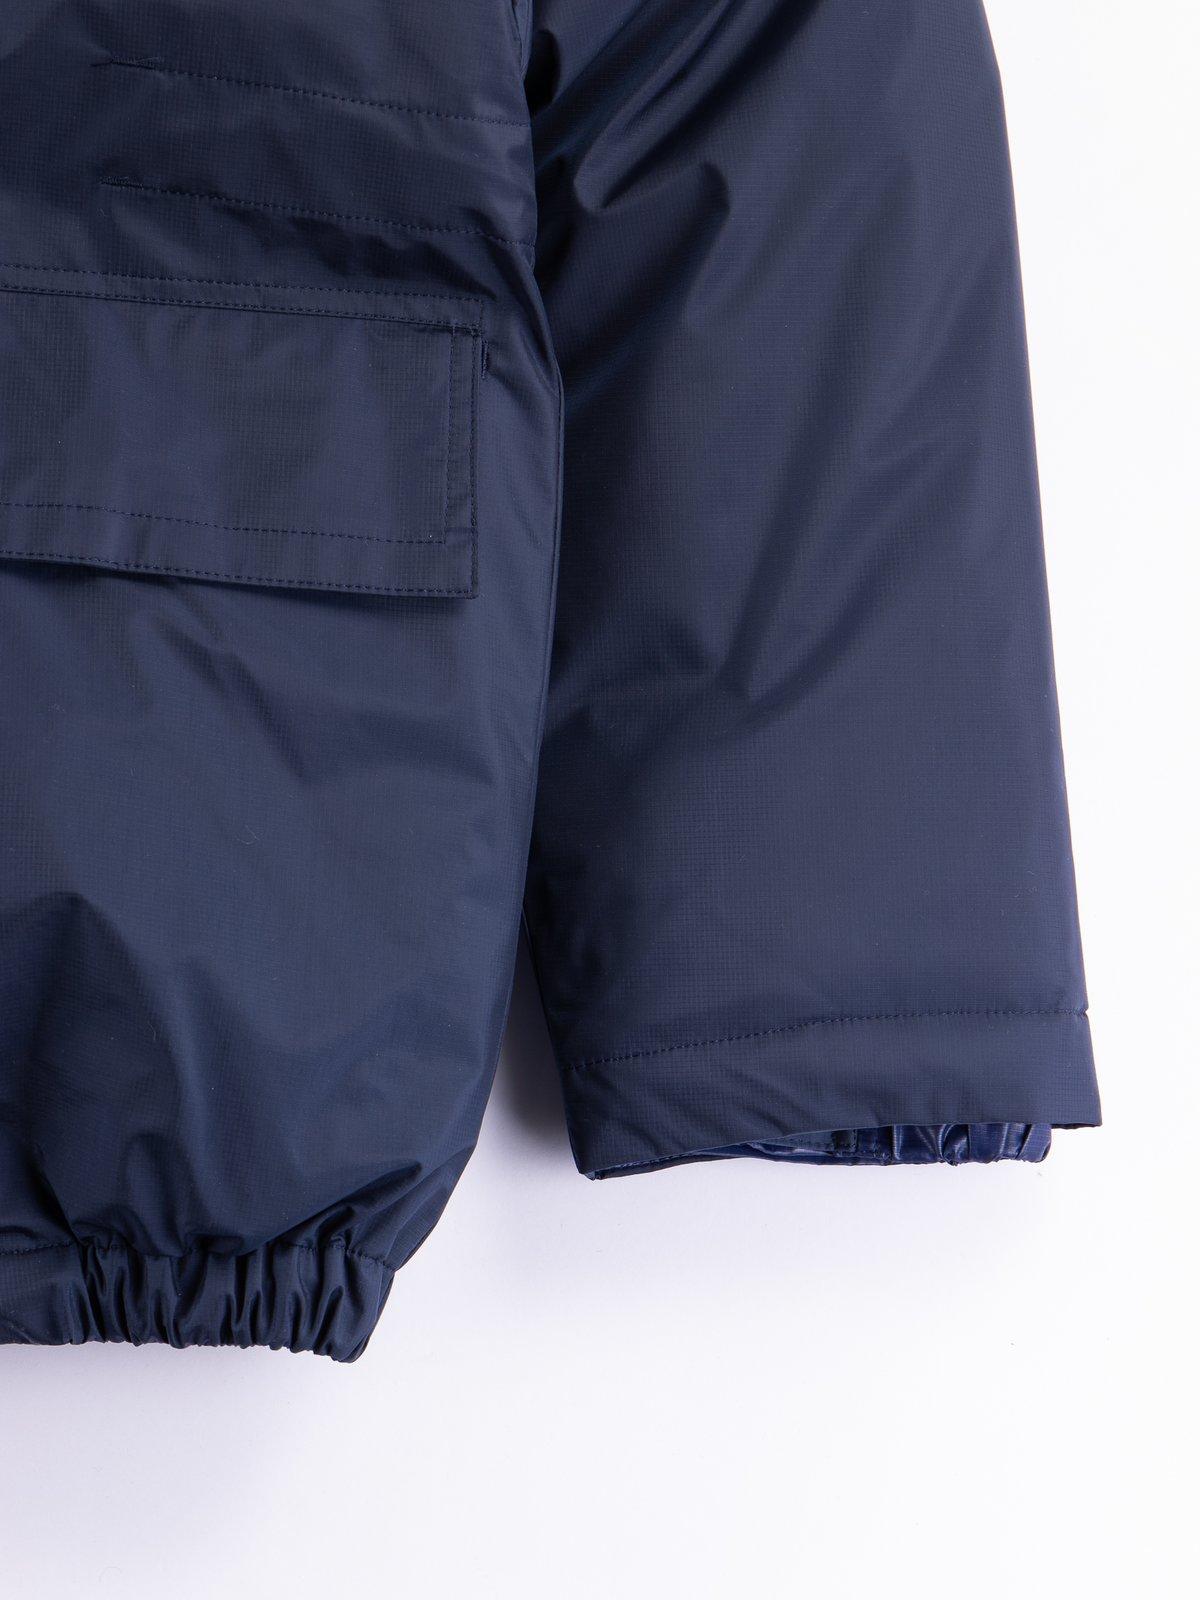 Navy/Blue Arktikal Down Jacket - Image 3